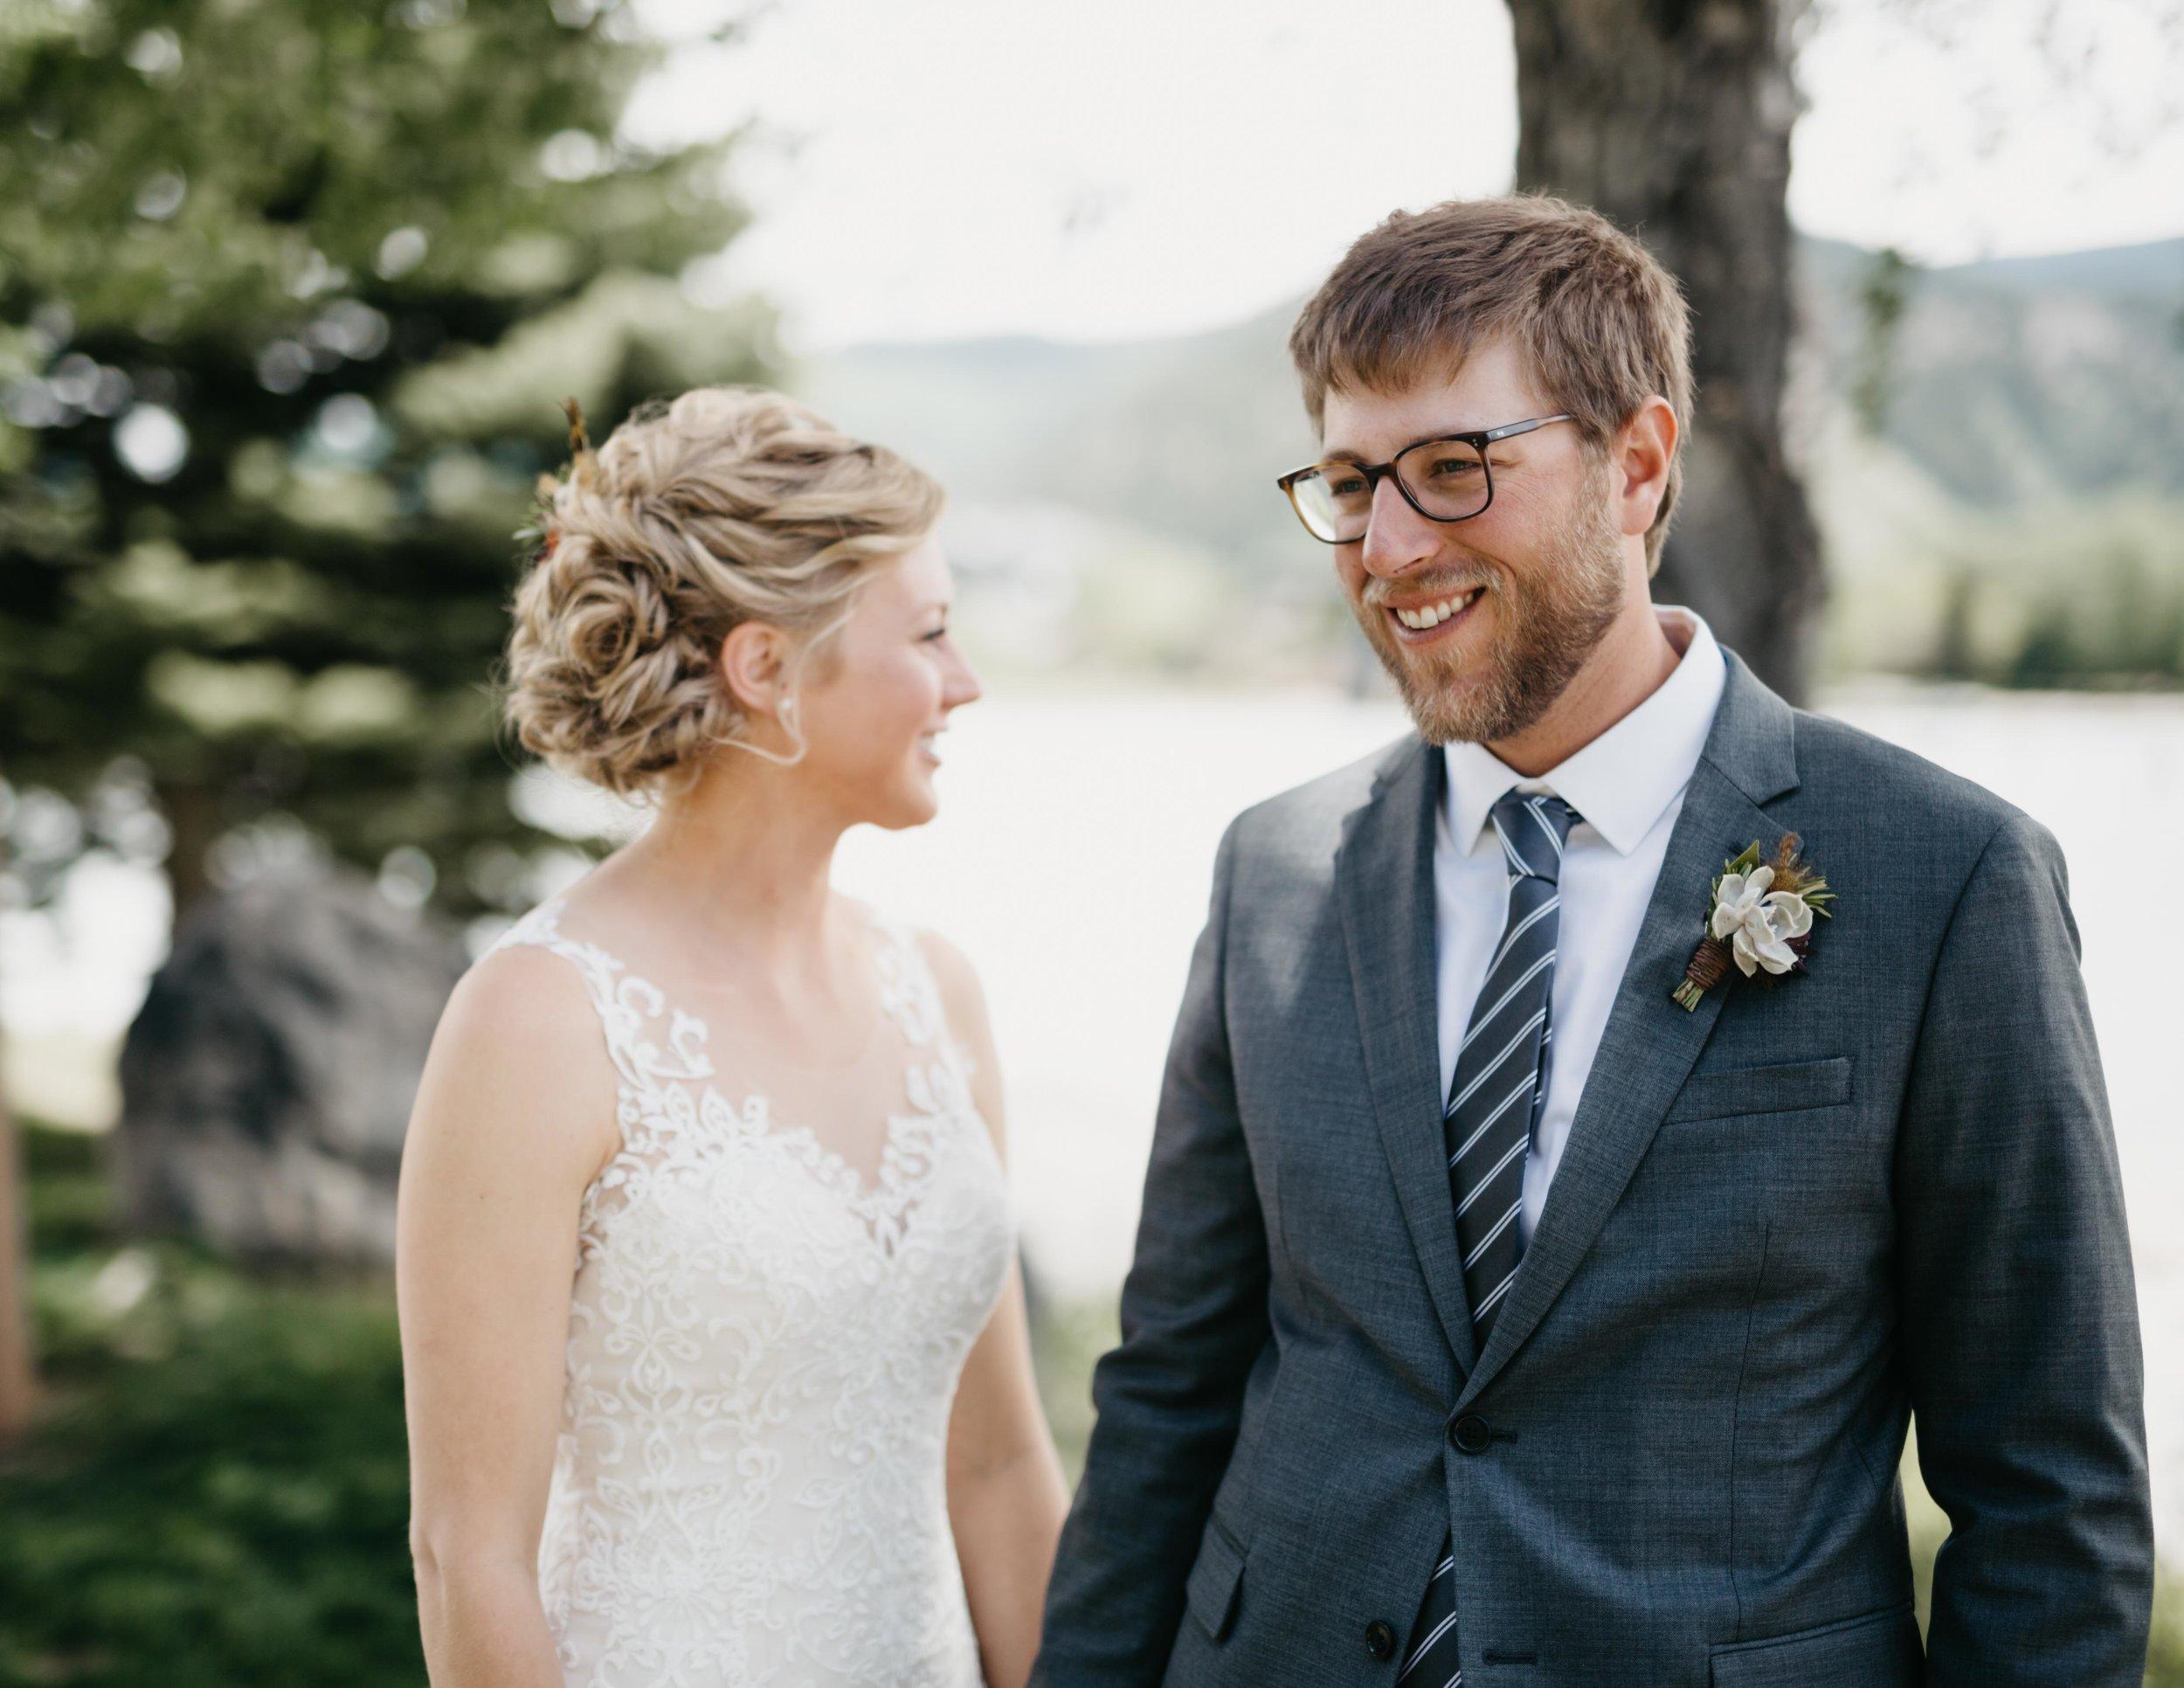 Colorado-Wedding-Photographer-26.jpg